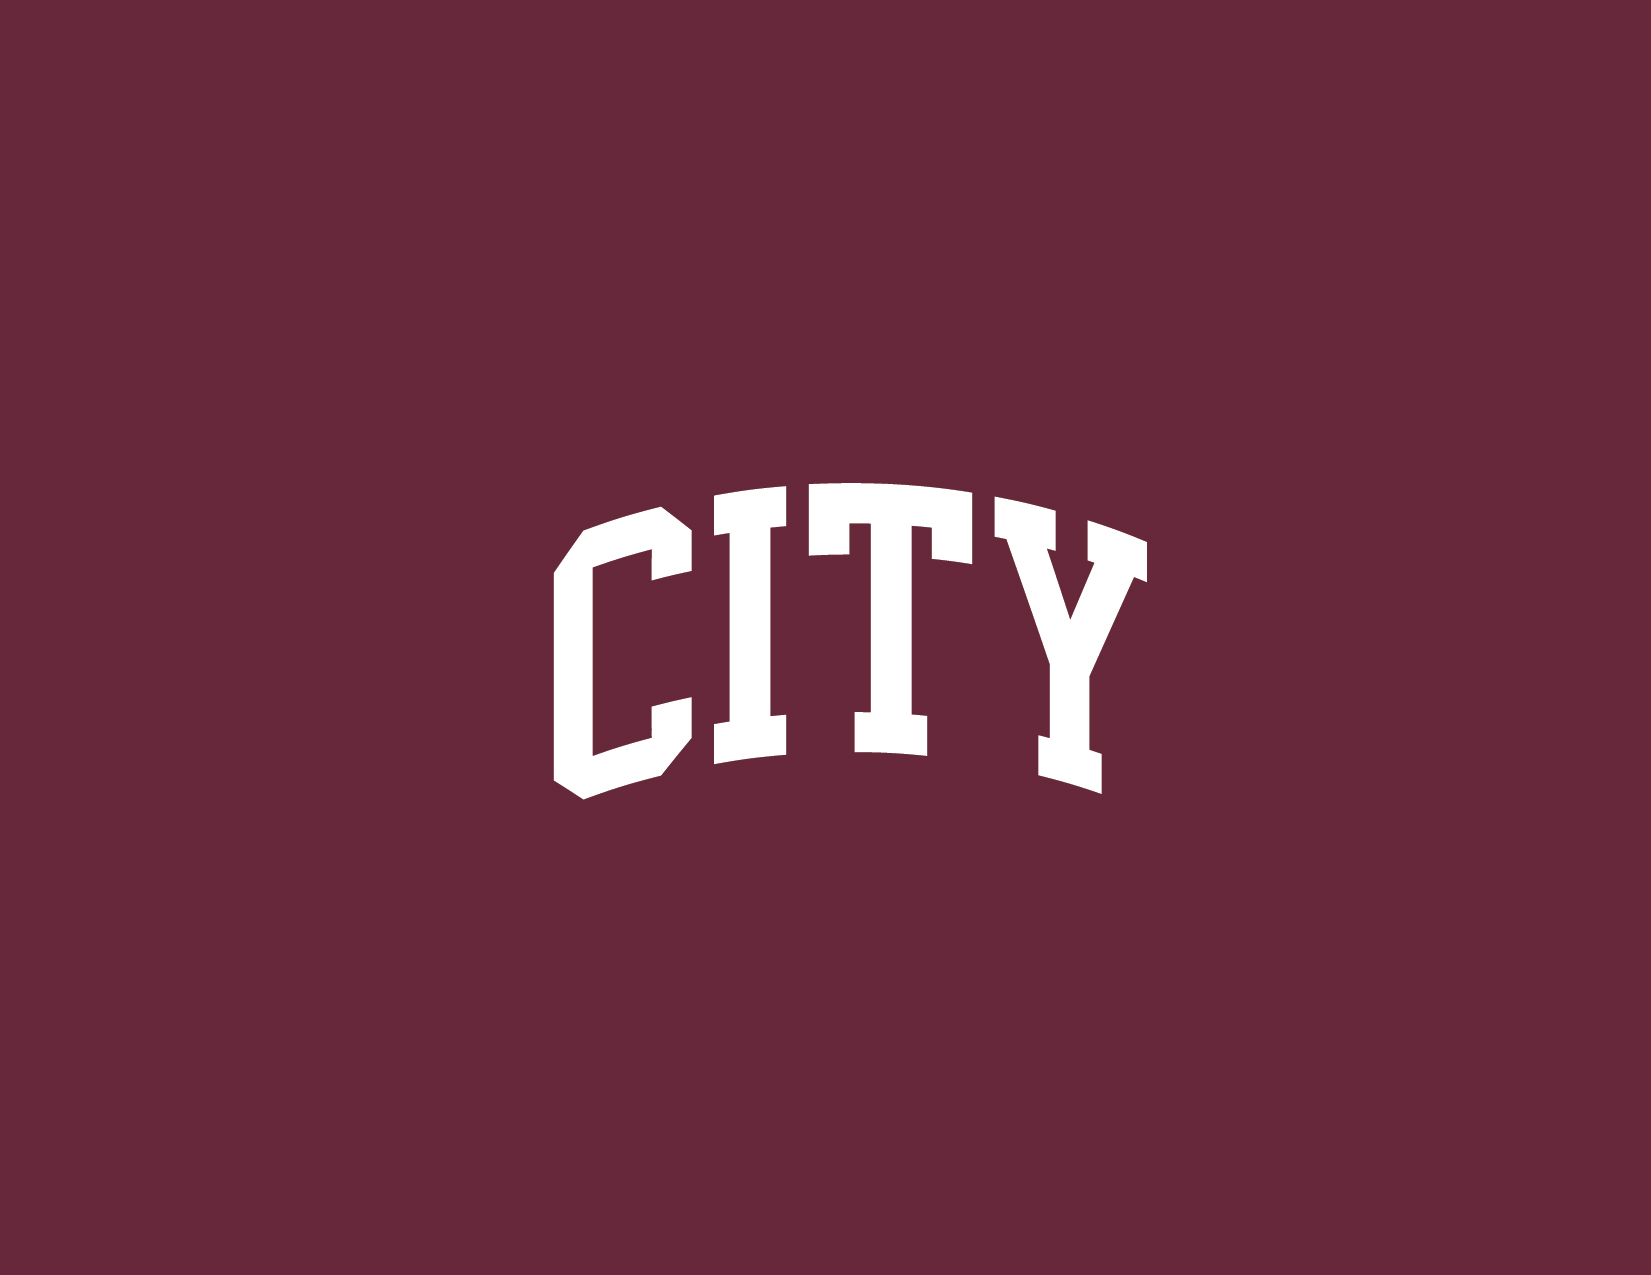 City James_City - Burg.jpg